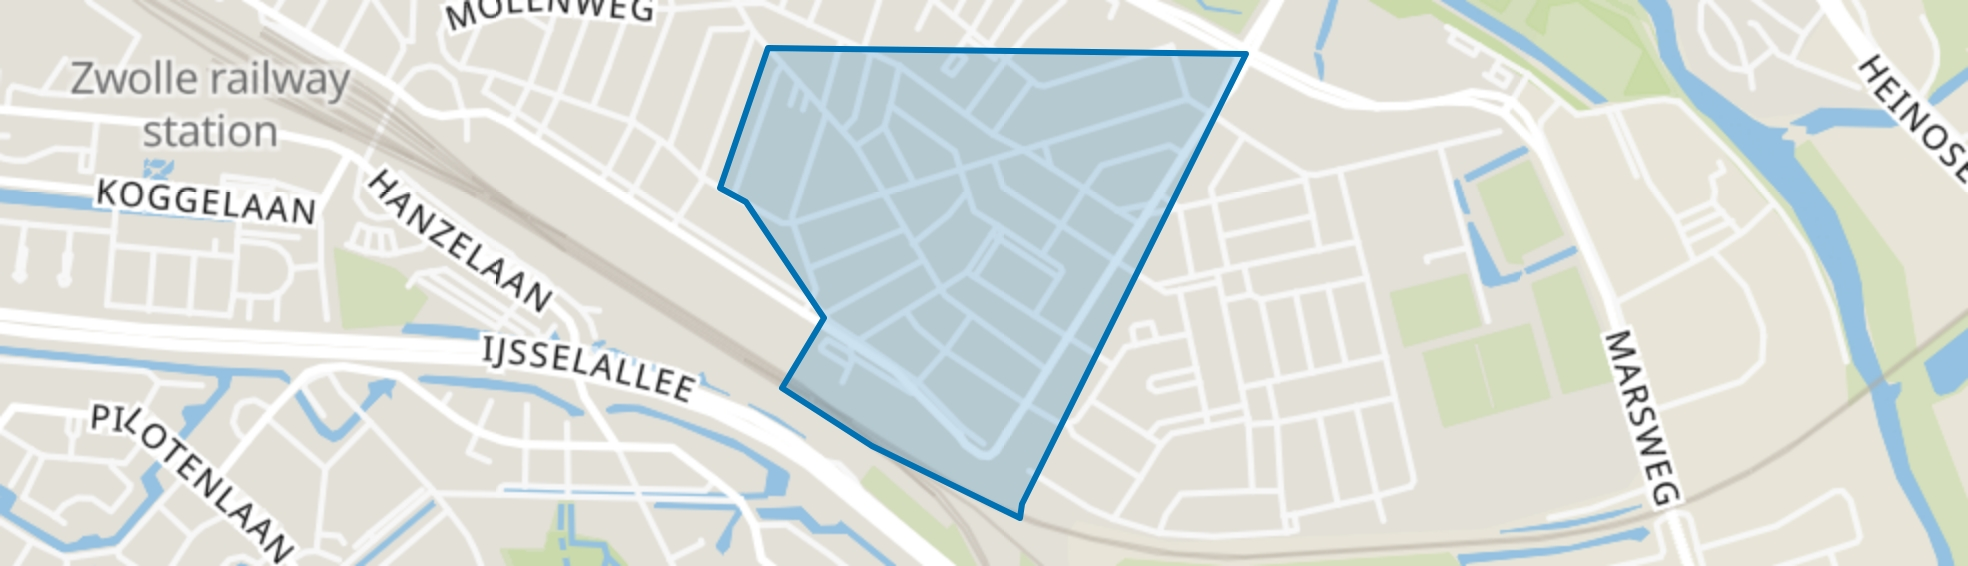 Nieuw-Assendorp, Zwolle map